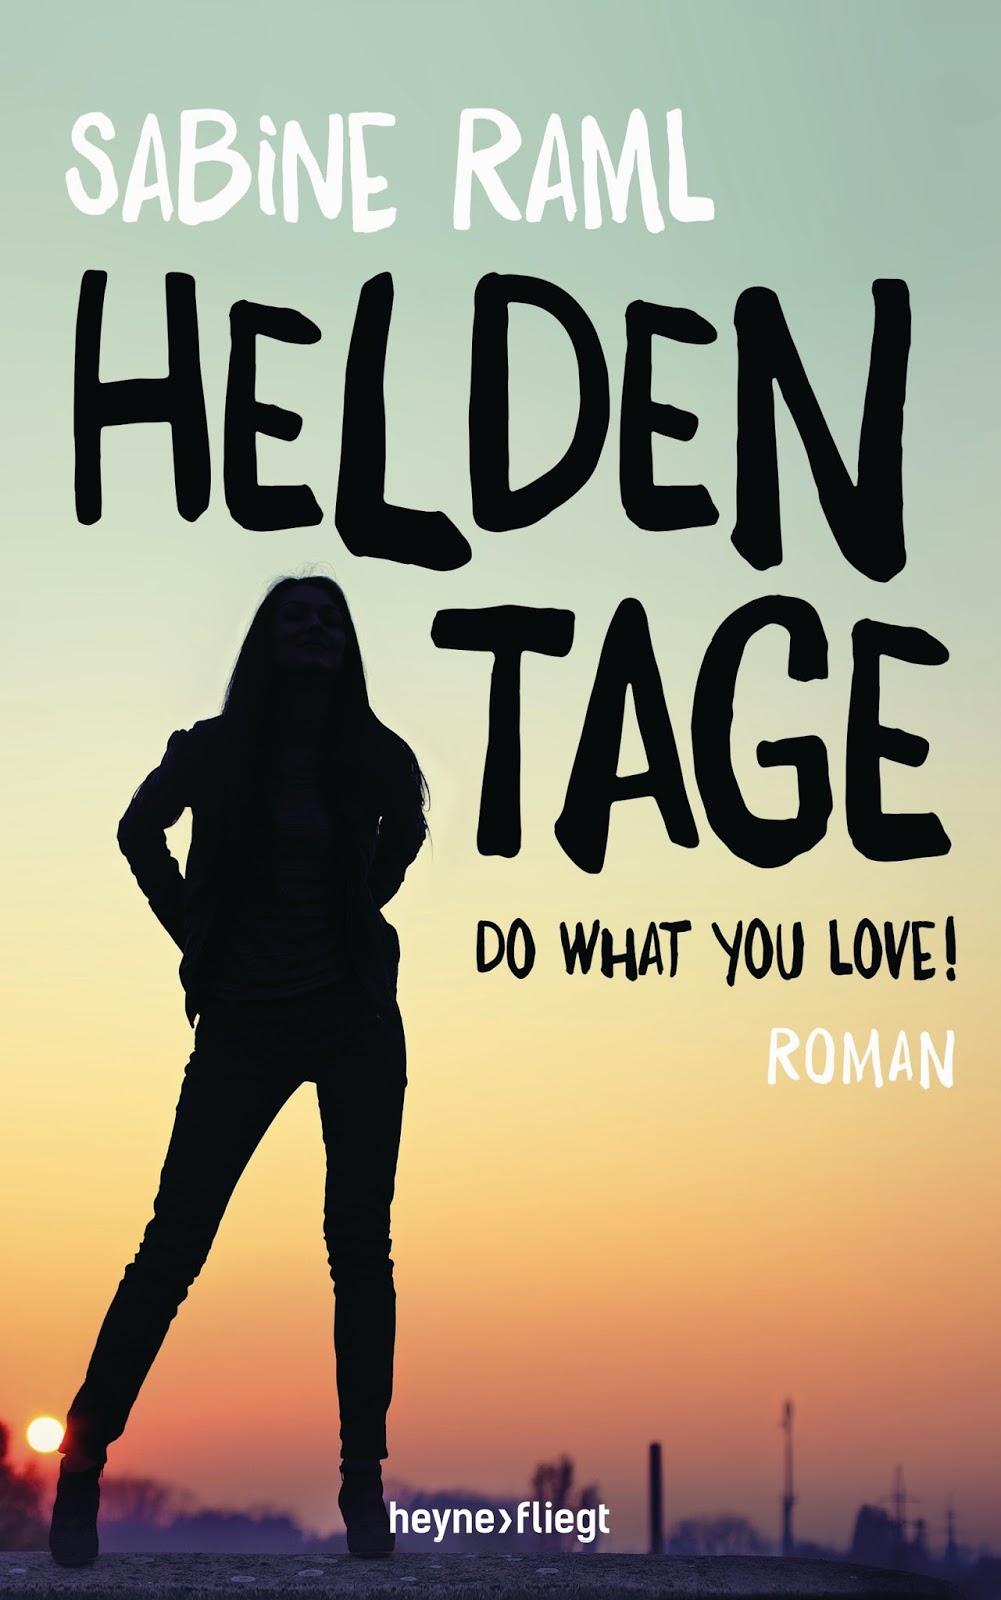 http://www.amazon.de/Heldentage-Roman-fliegt-Sabine-Raml/dp/3453269608/ref=sr_1_1_twi_1?ie=UTF8&qid=1422724162&sr=8-1&keywords=heldentage